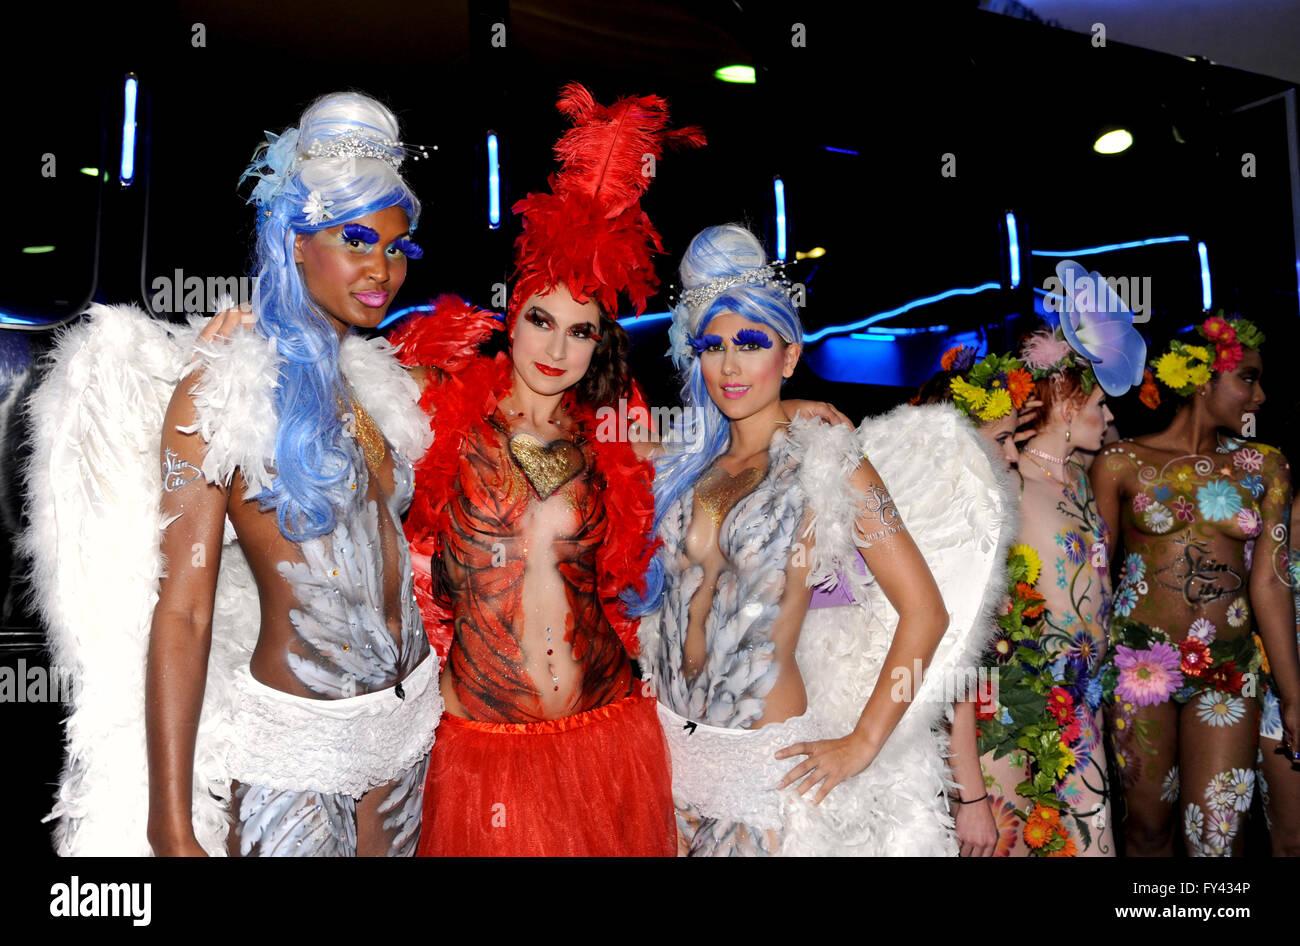 Las Vegas, Nevada, USA. 20th Apr, 2016. Robin Slonina and The Sapphire Gentleman's Club Showroom & Lounge - Stock Image